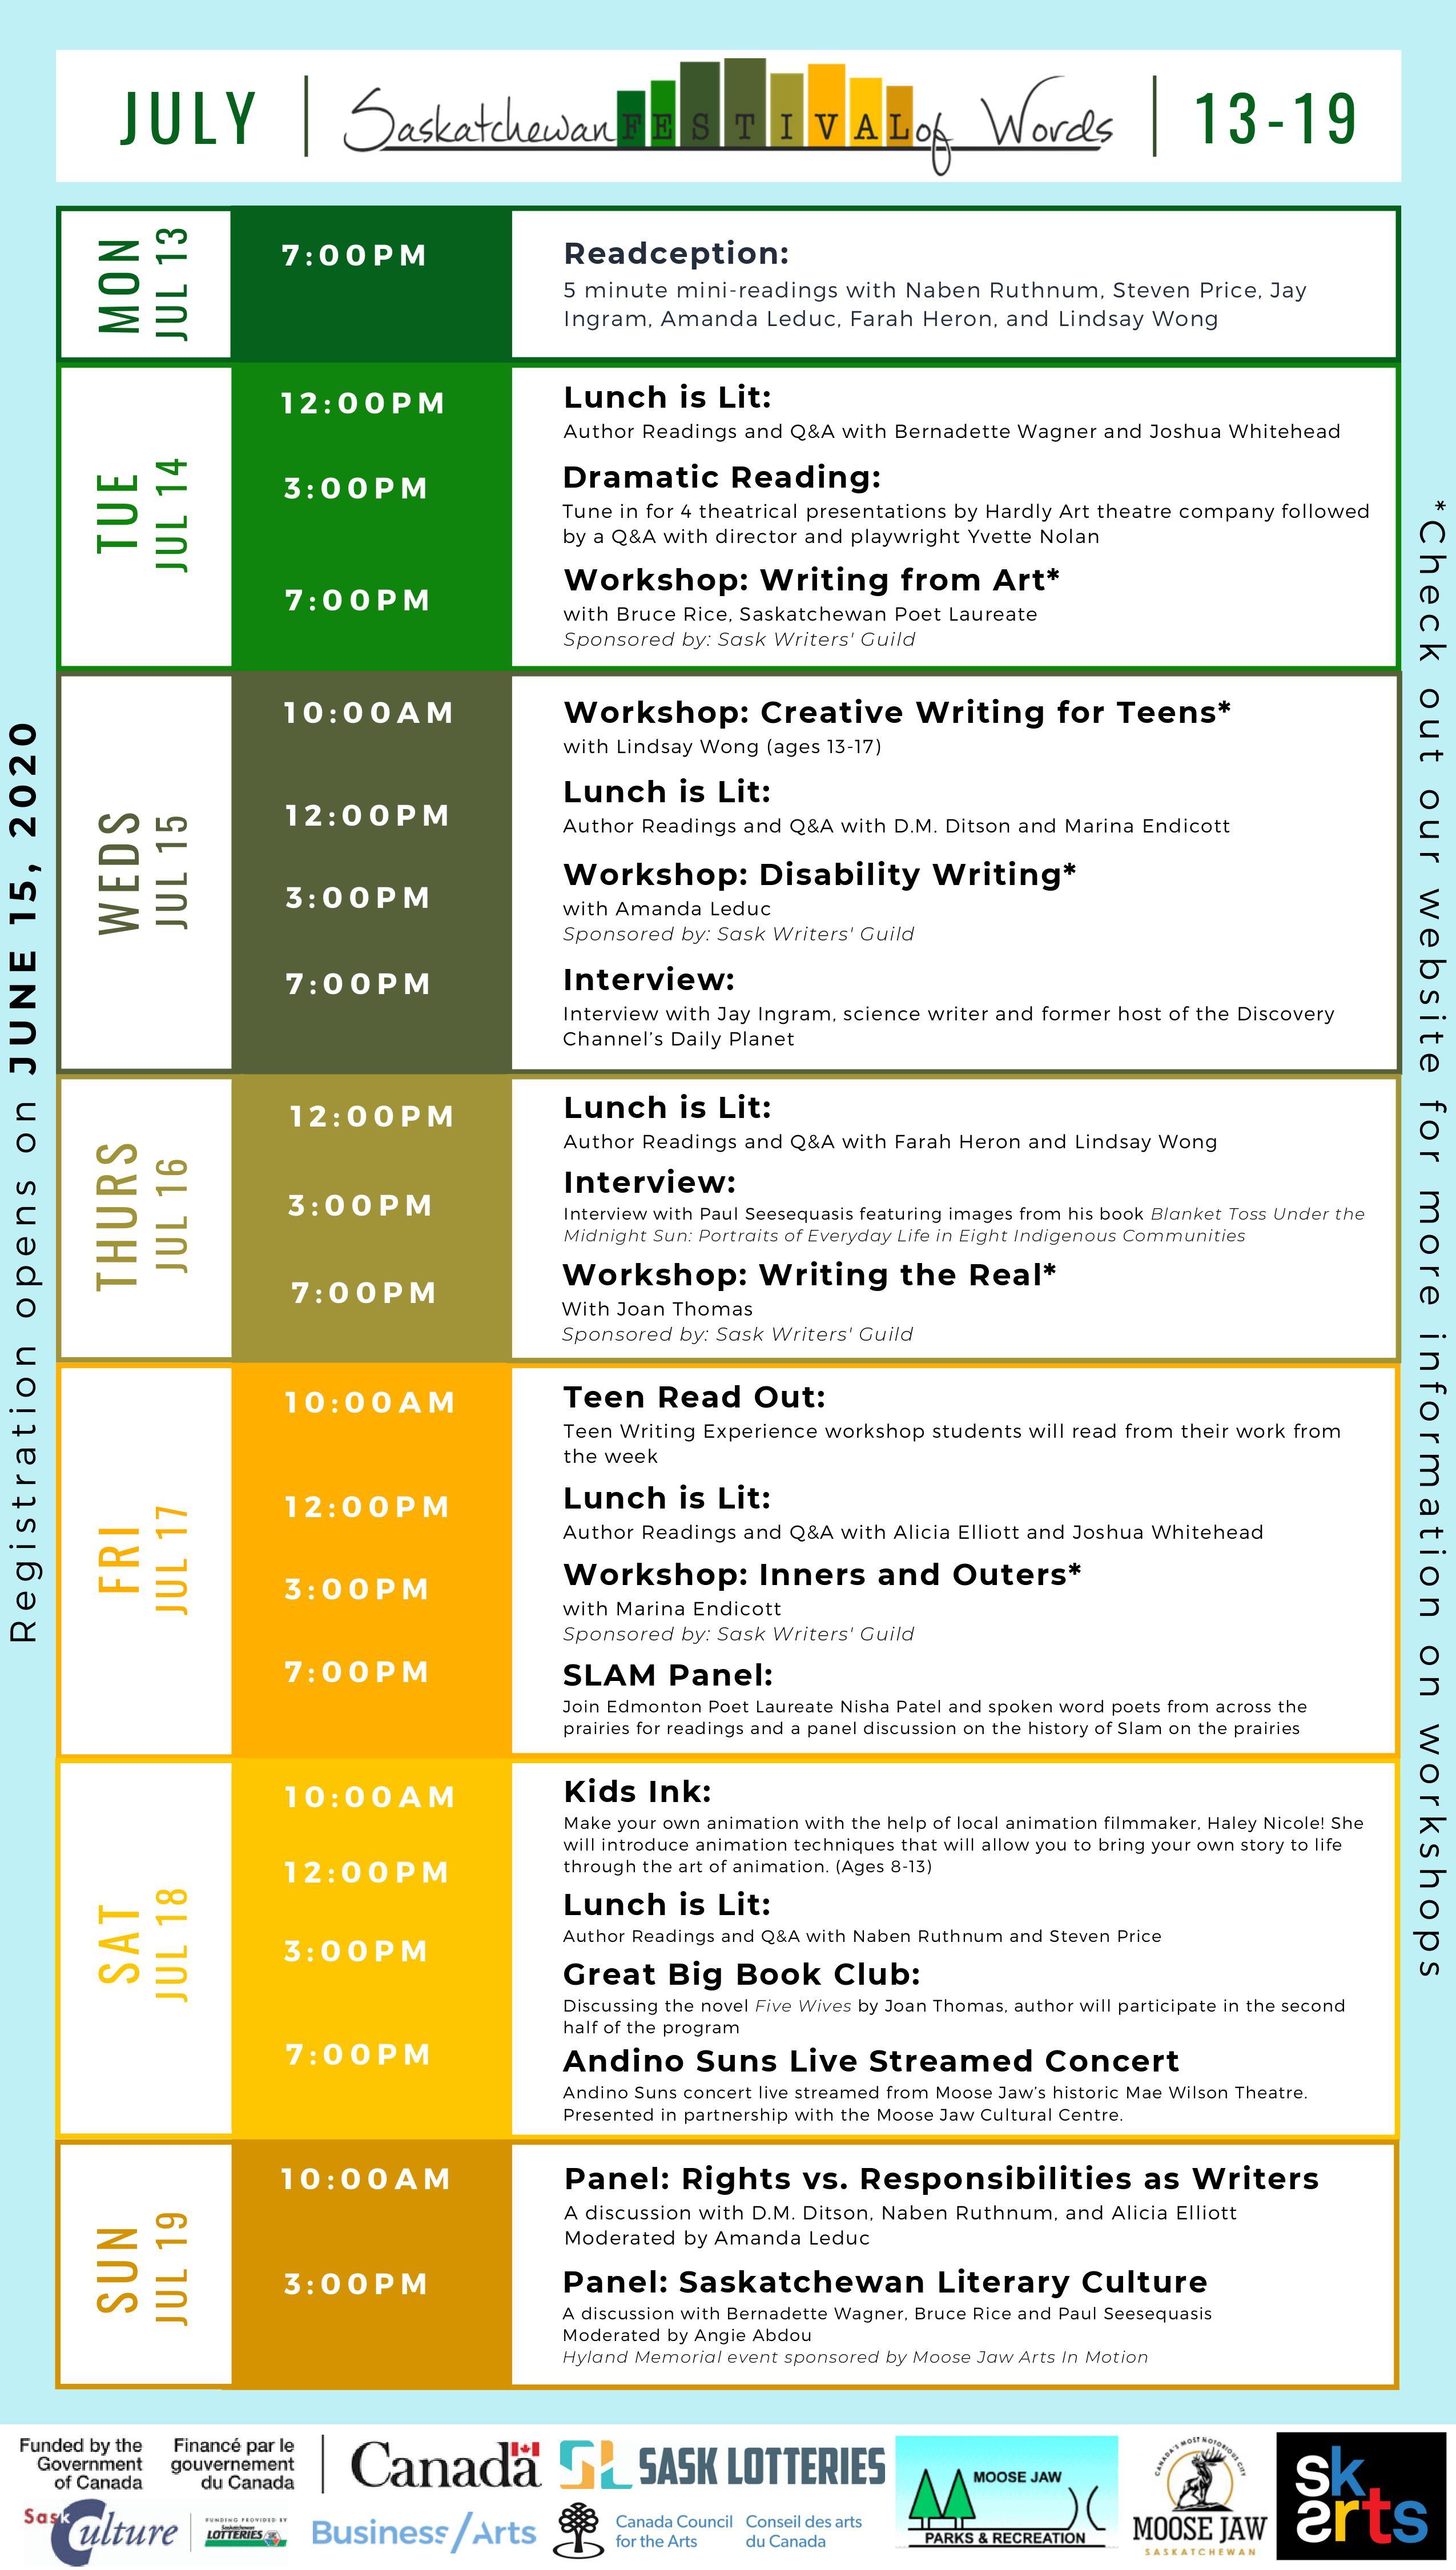 Saskatchewan Festival of Words - Image 1